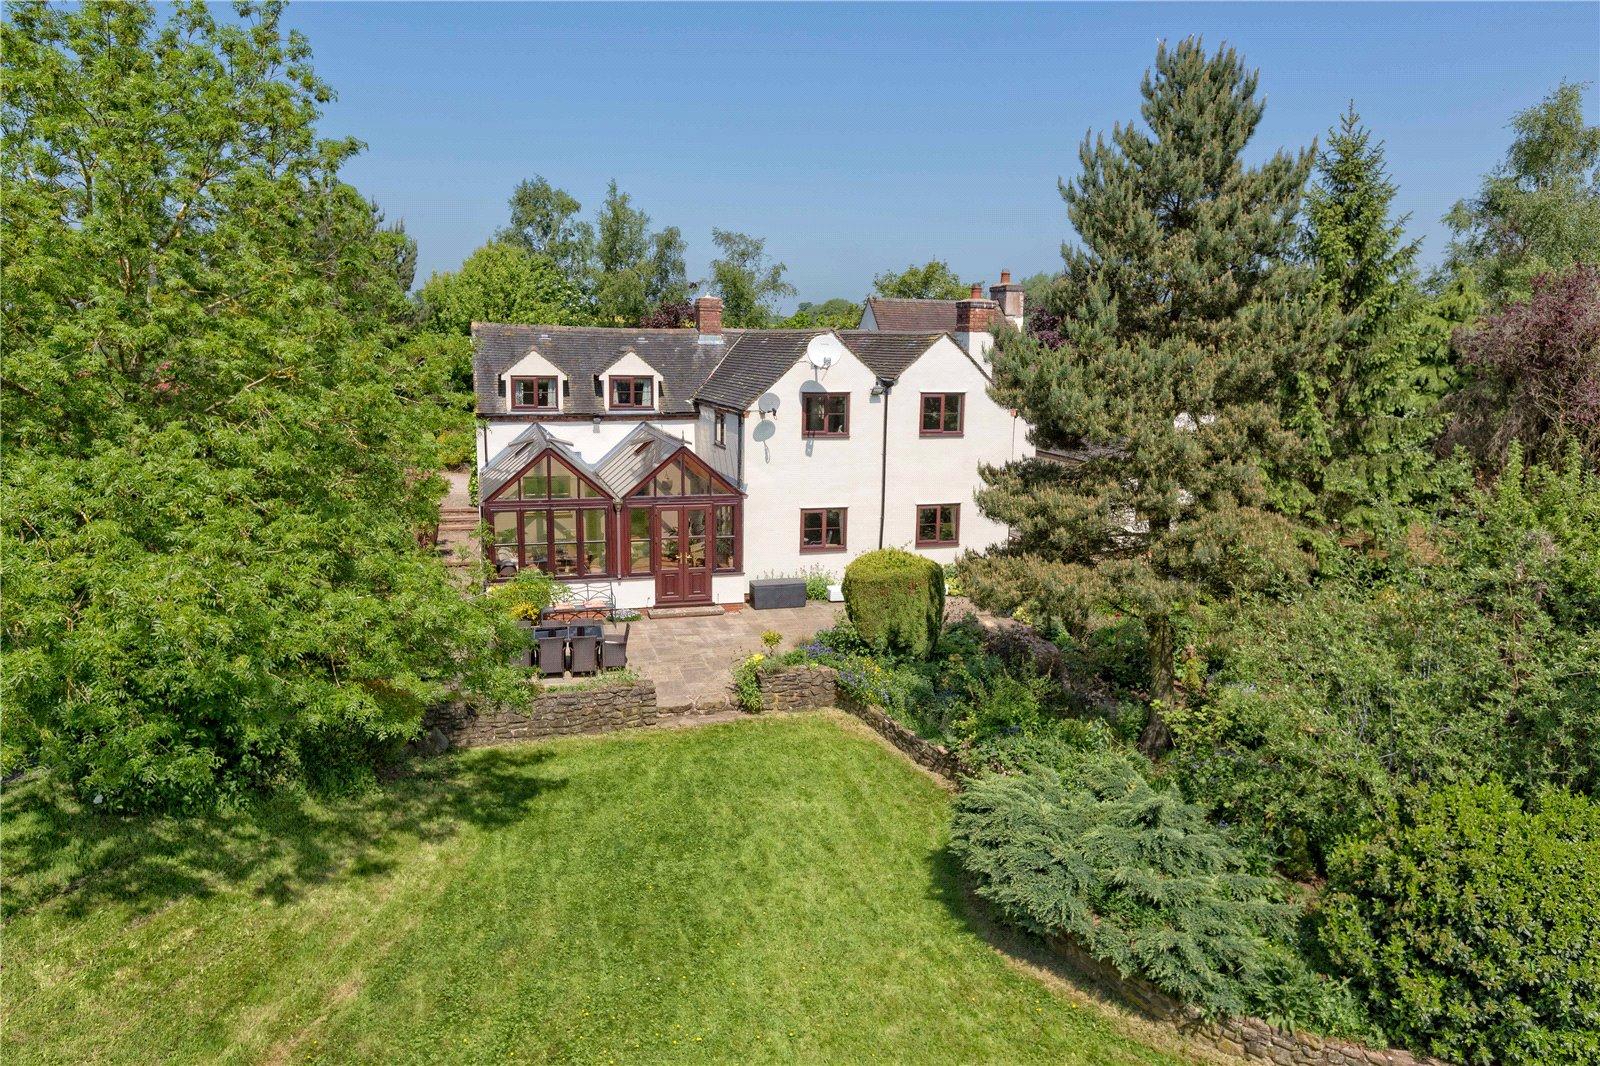 The Ridges Farm, Faintree, Bridgnorth, Shropshire, WV16